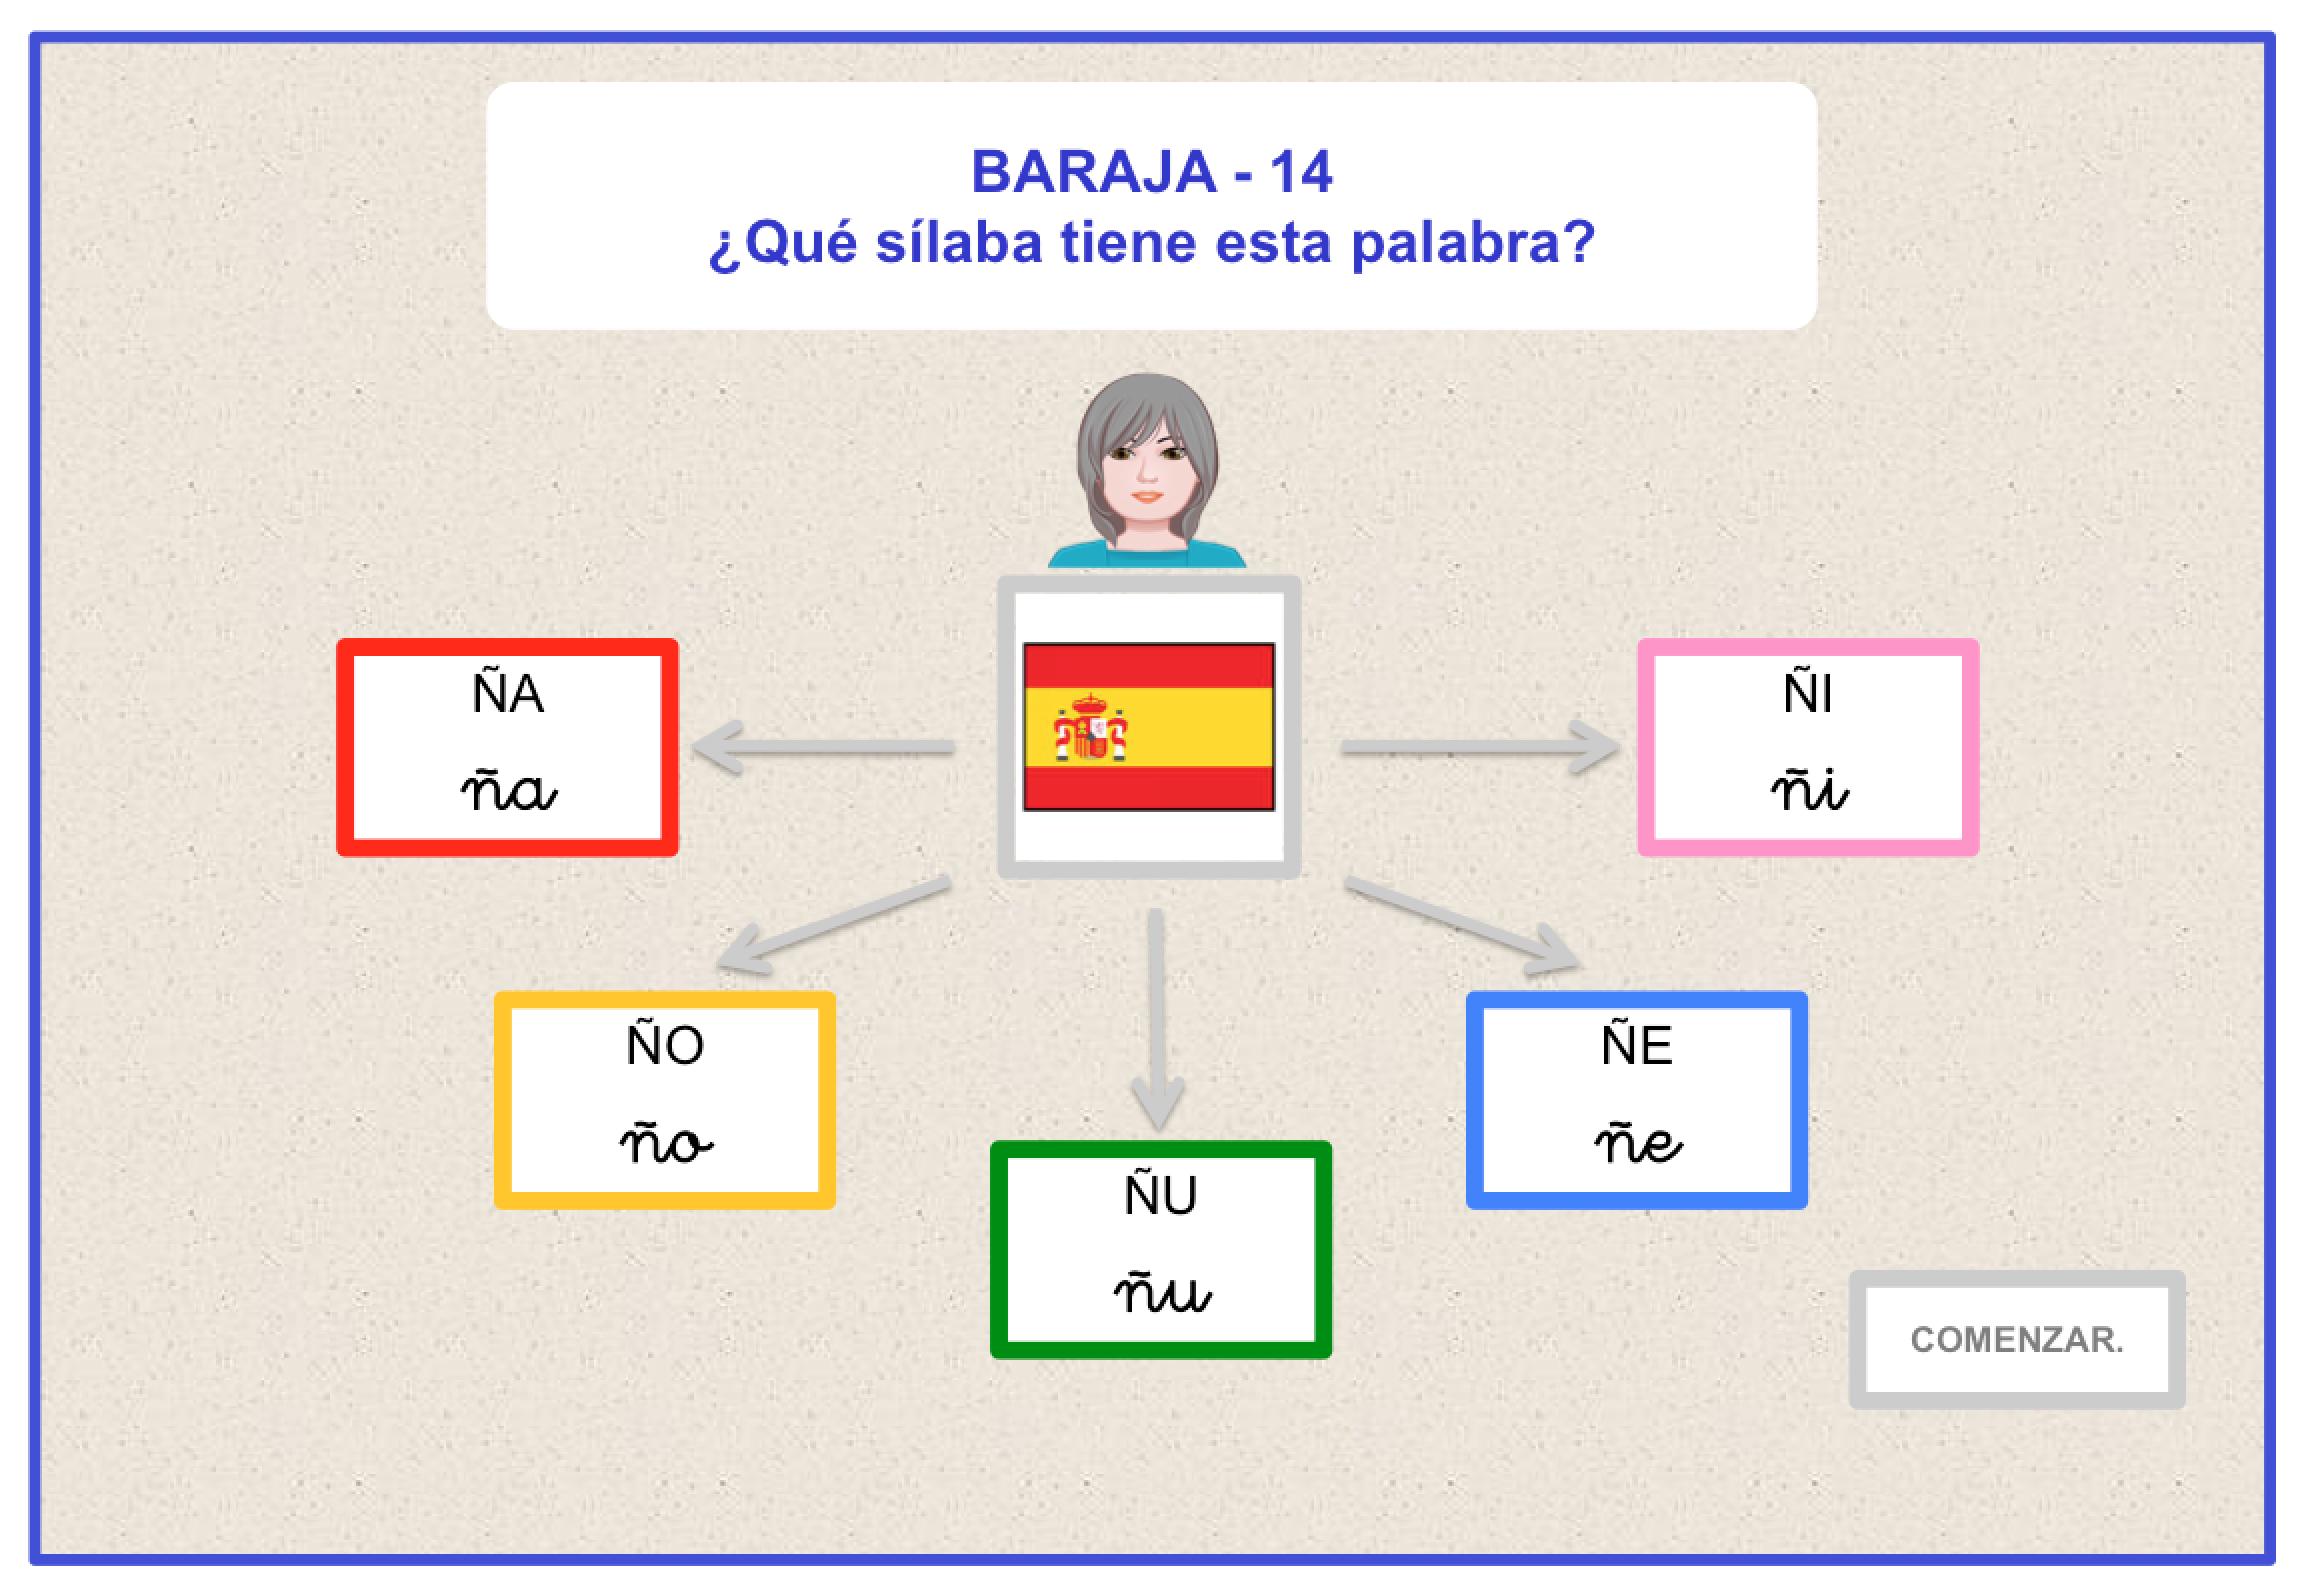 baraja-14